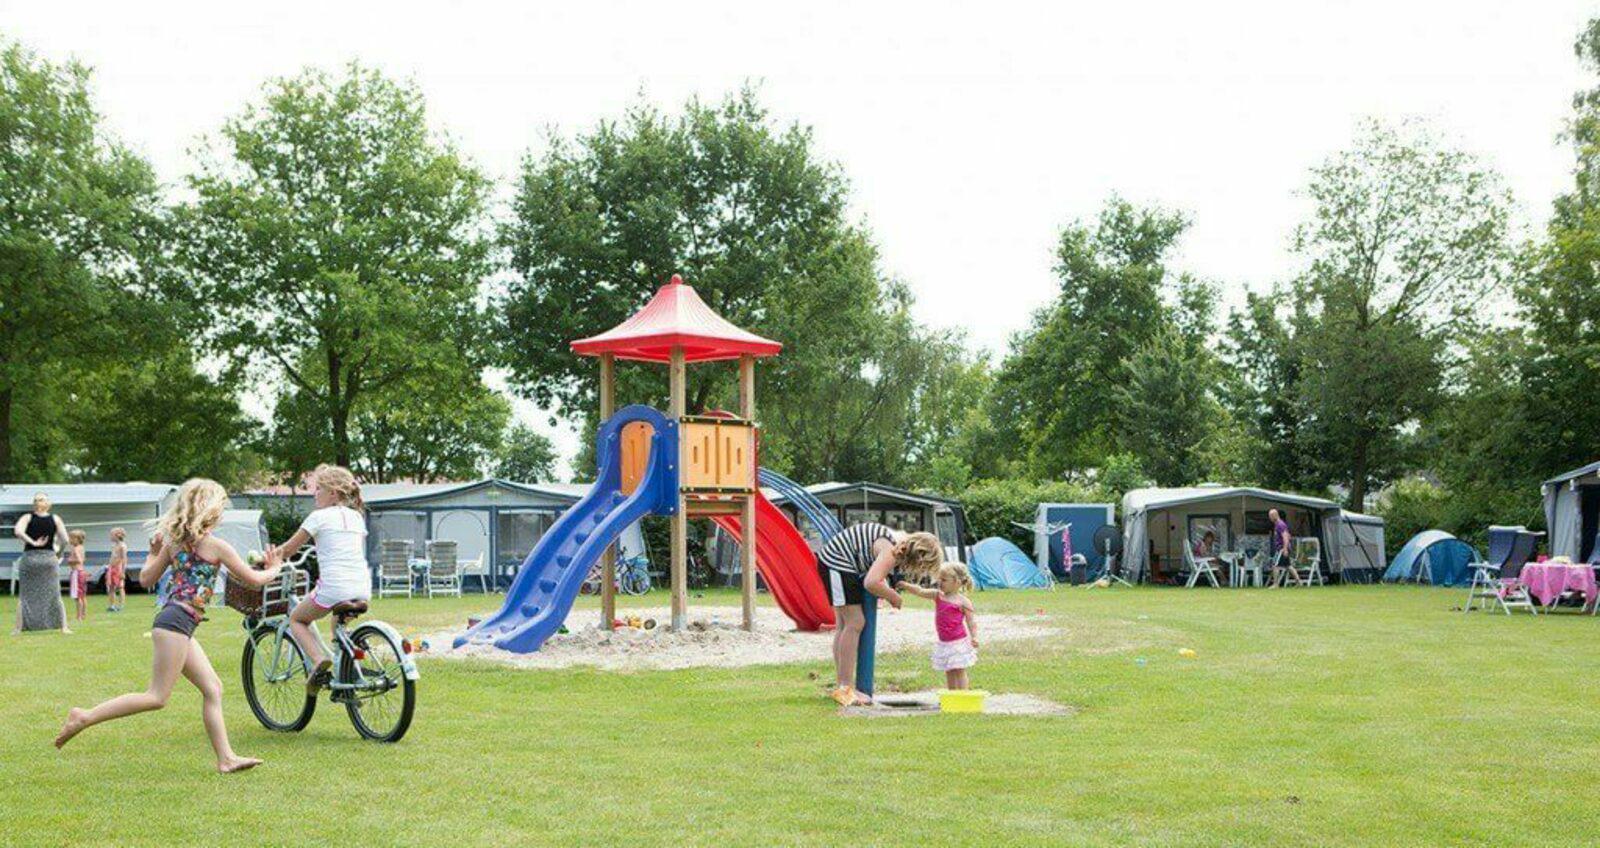 Comfort plus kampeerplaats | Camping t Veld